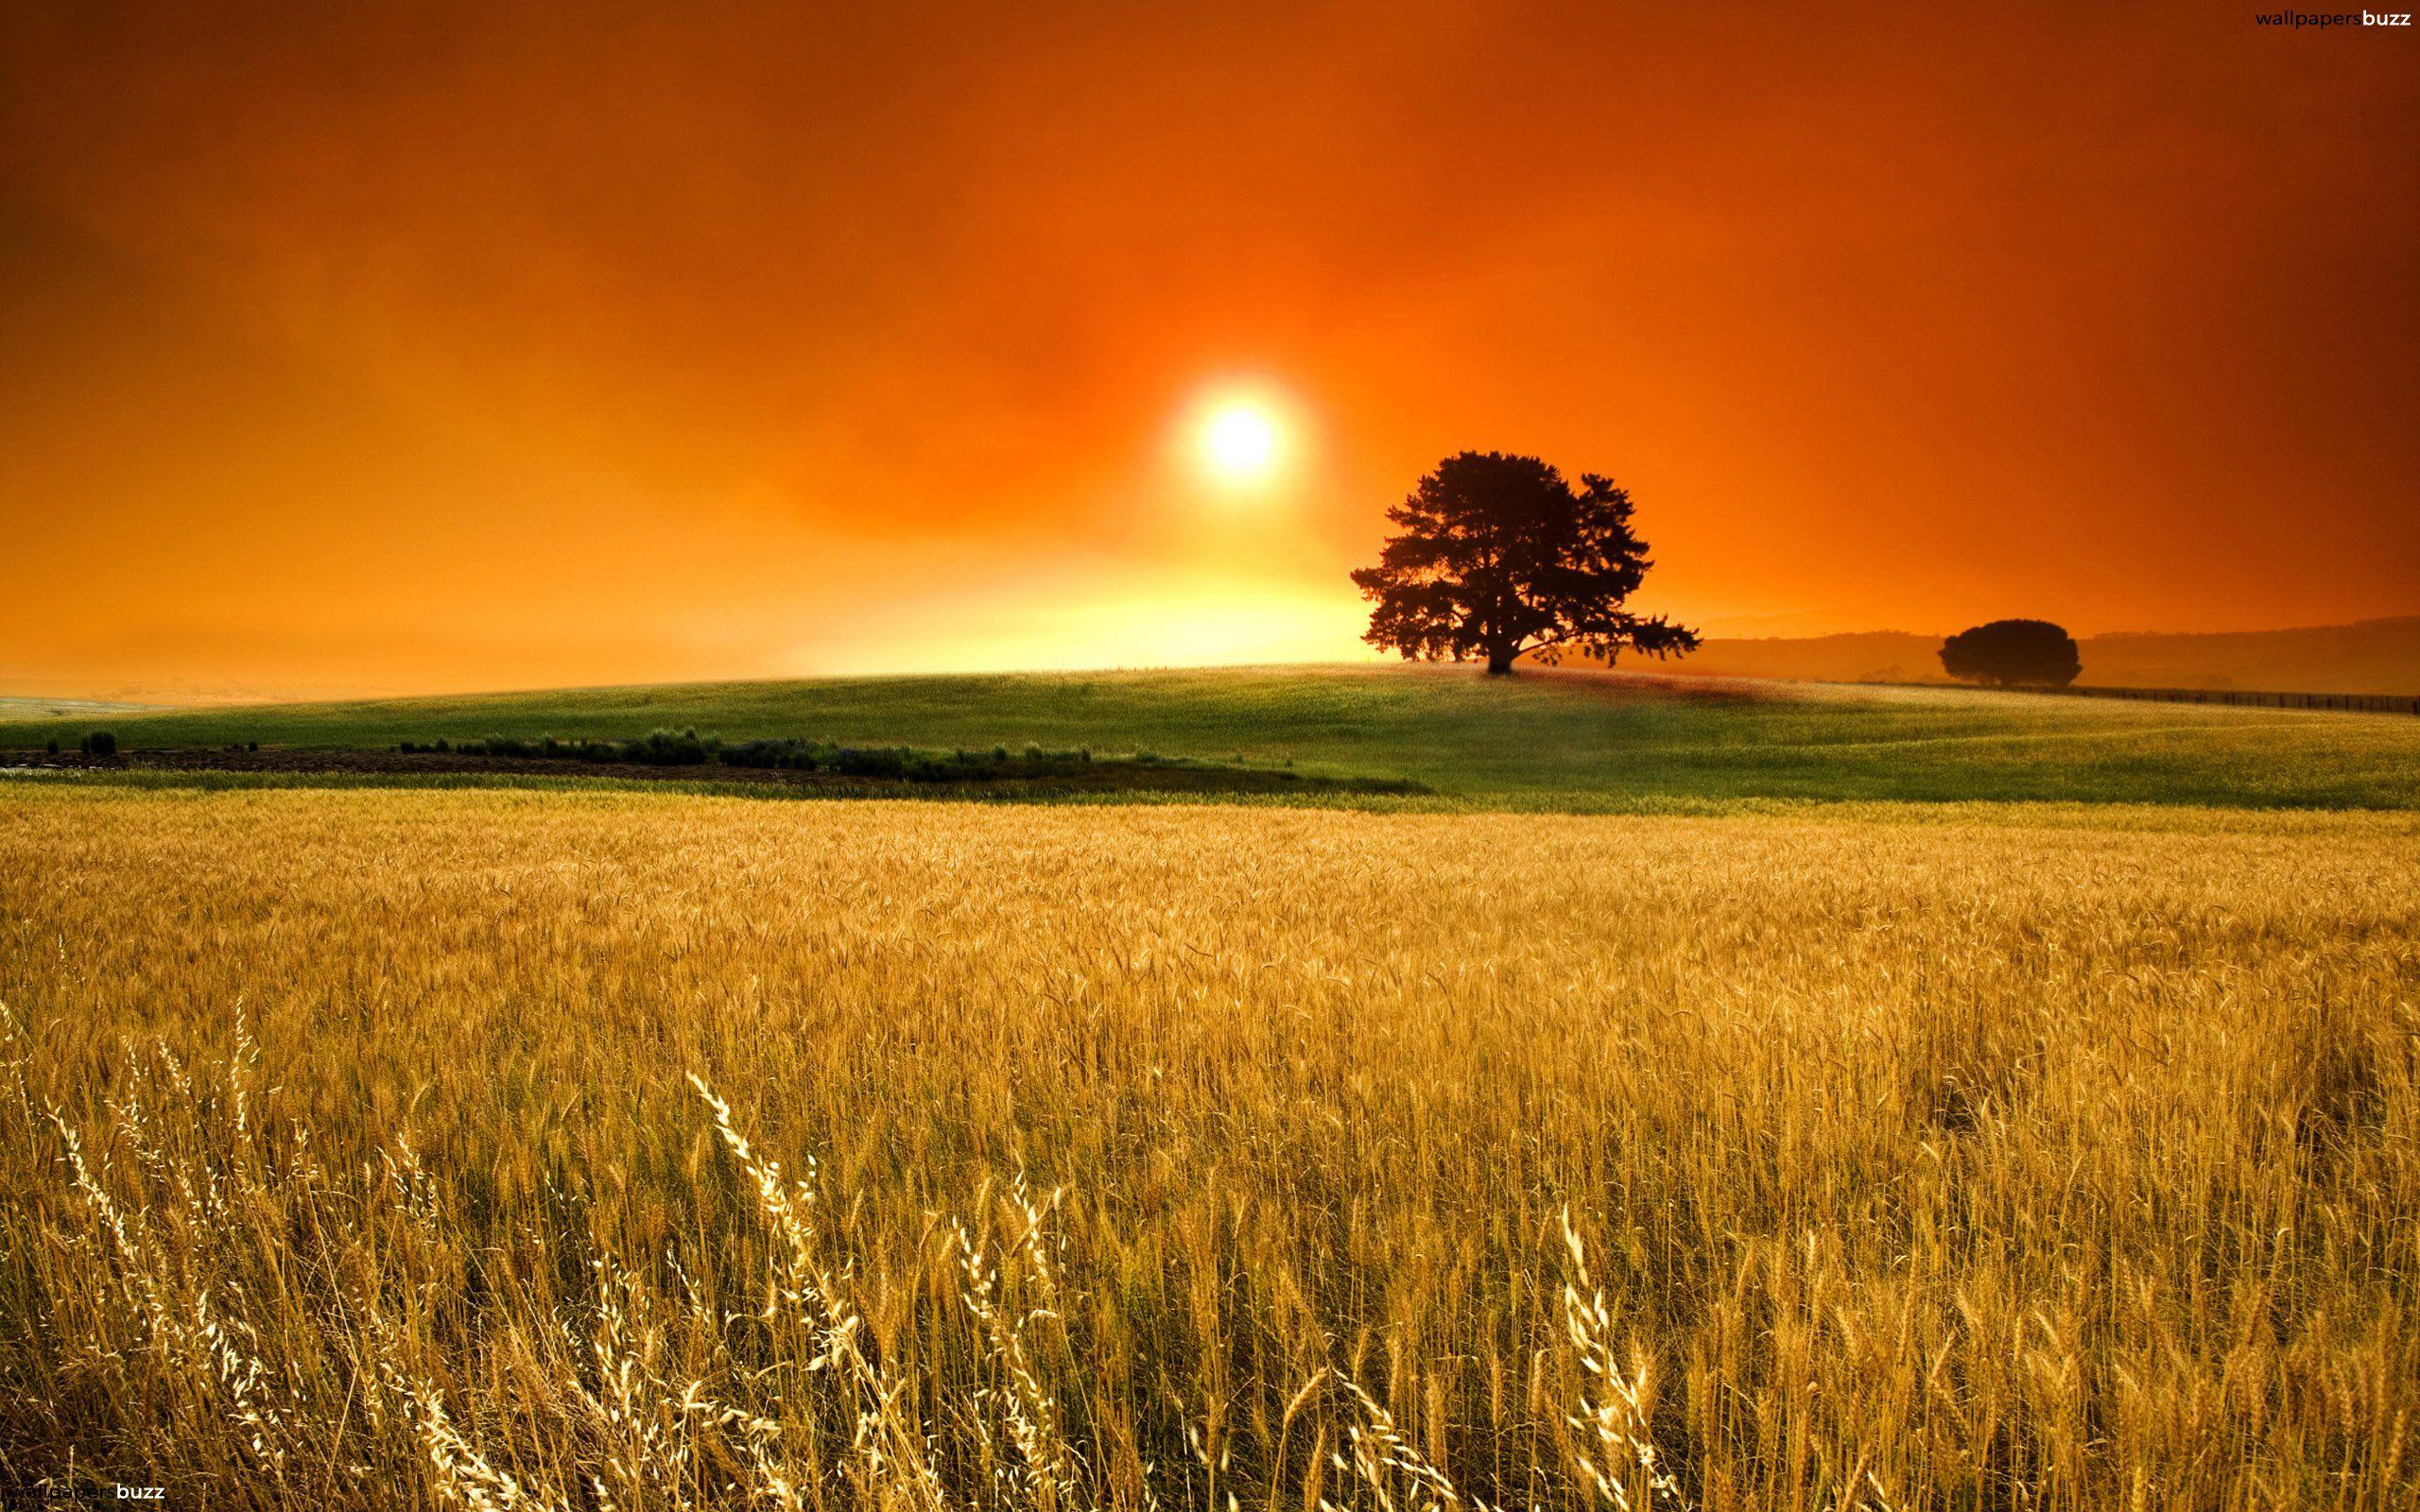 Sunset Scenery Wallpaper Landscape Wallpaper Scenery Background